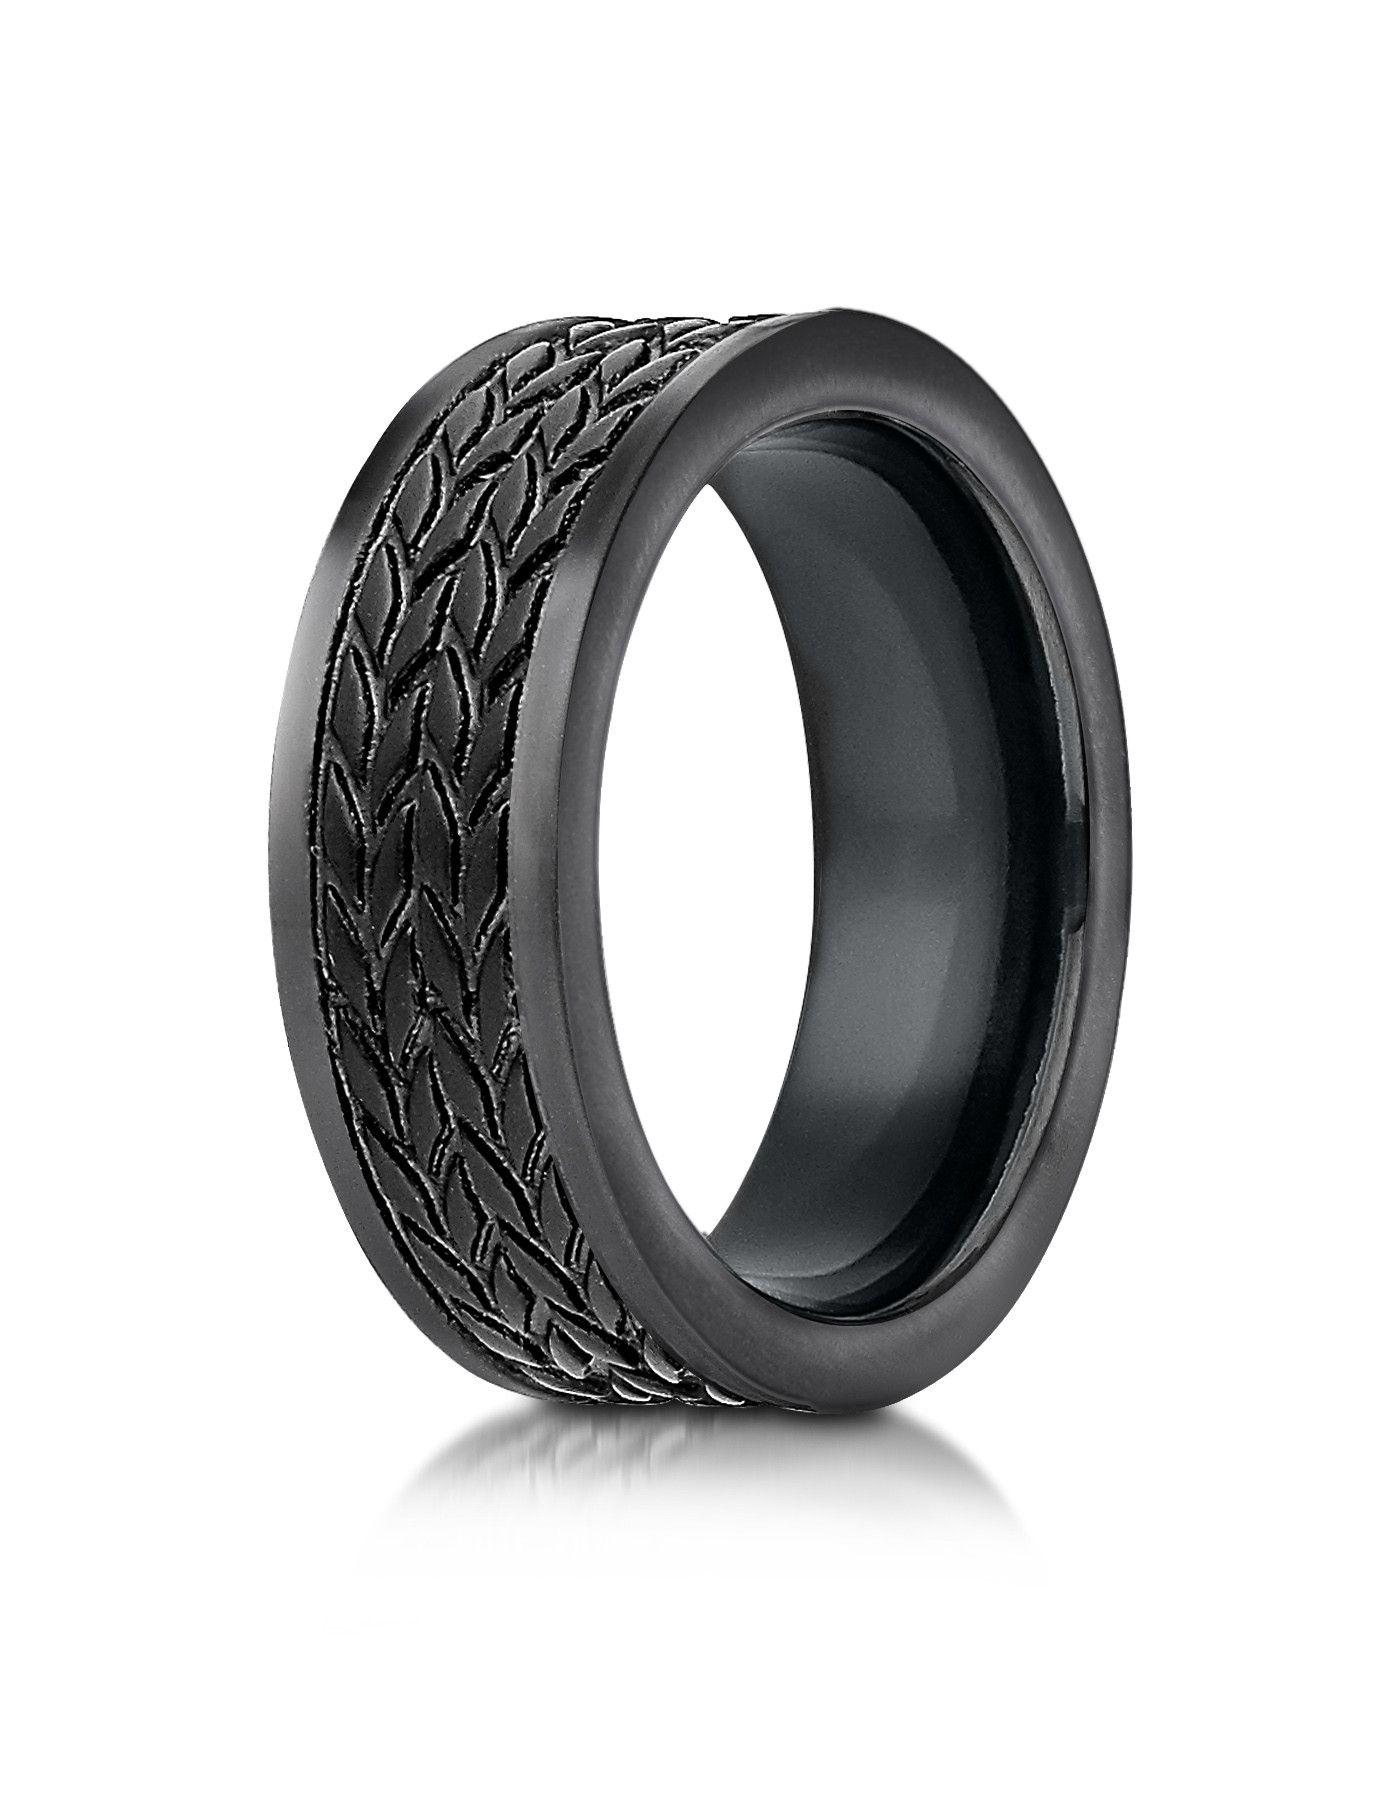 CAPRI Black Cobalt Wedding Band for Men with Tire Tread